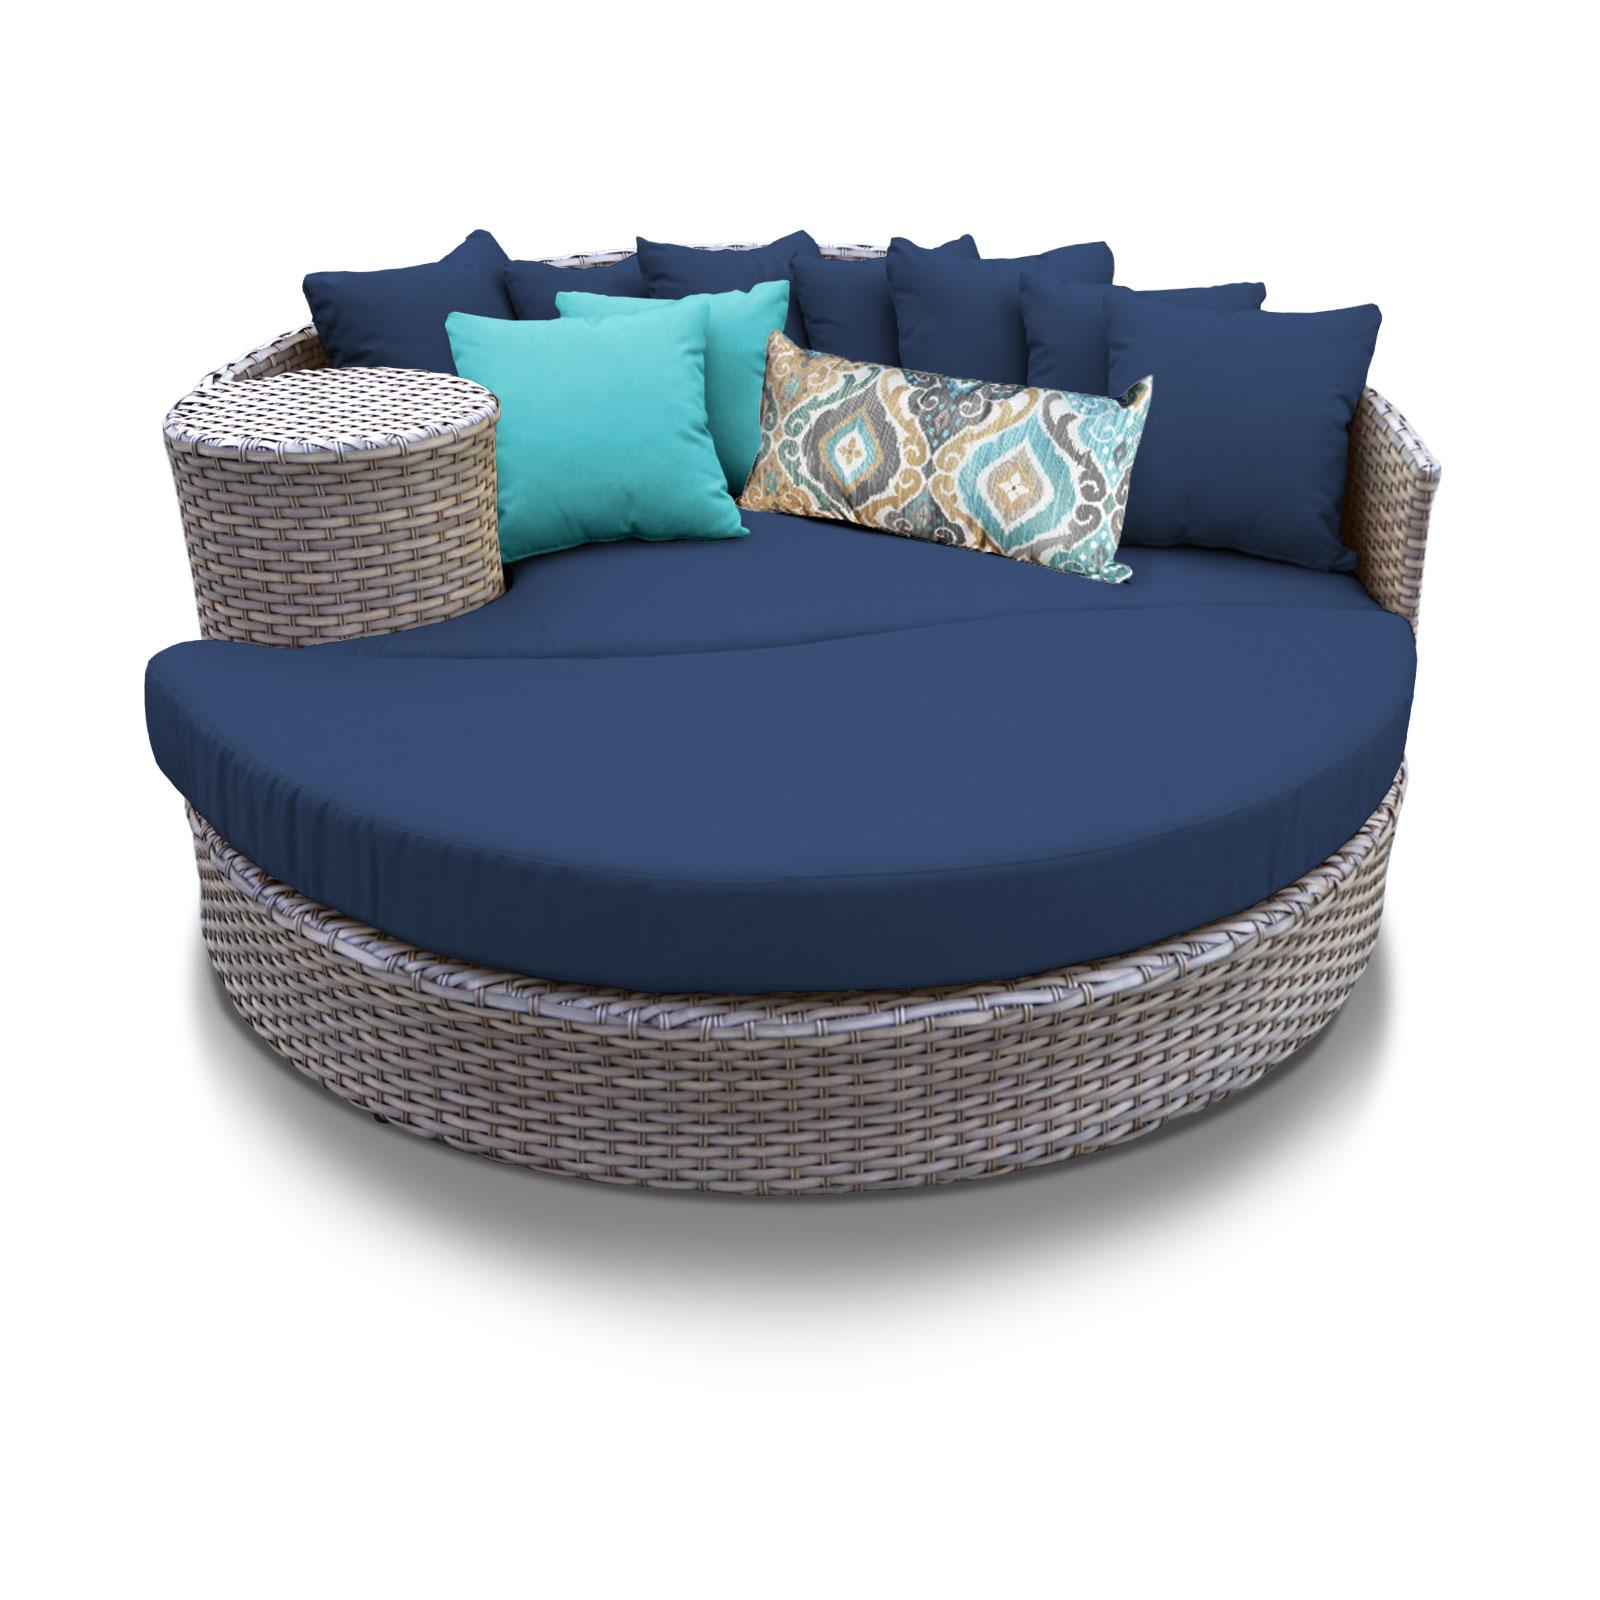 Navy Oasis Circular Sun Bed Outdoor Wicker Patio Furniture Tk Clics